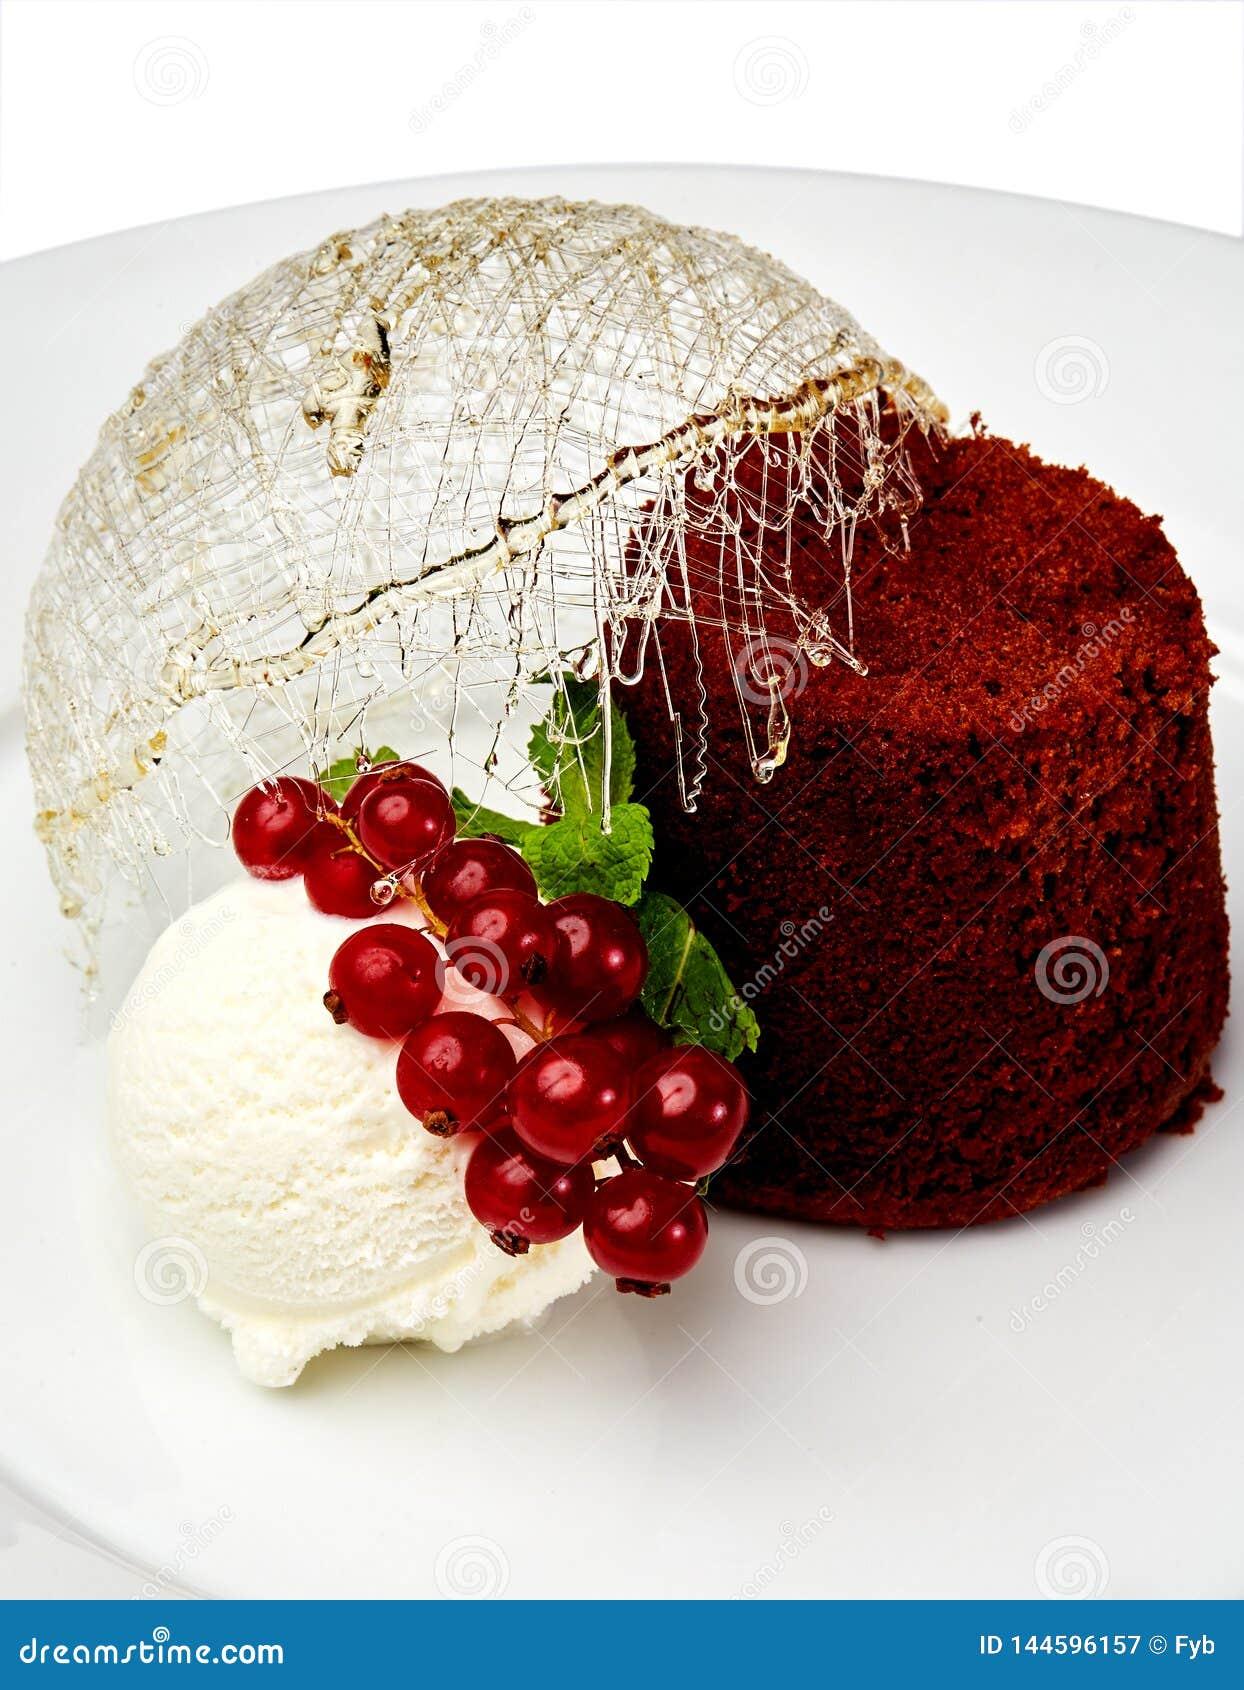 Fancy dessert isolatad on white